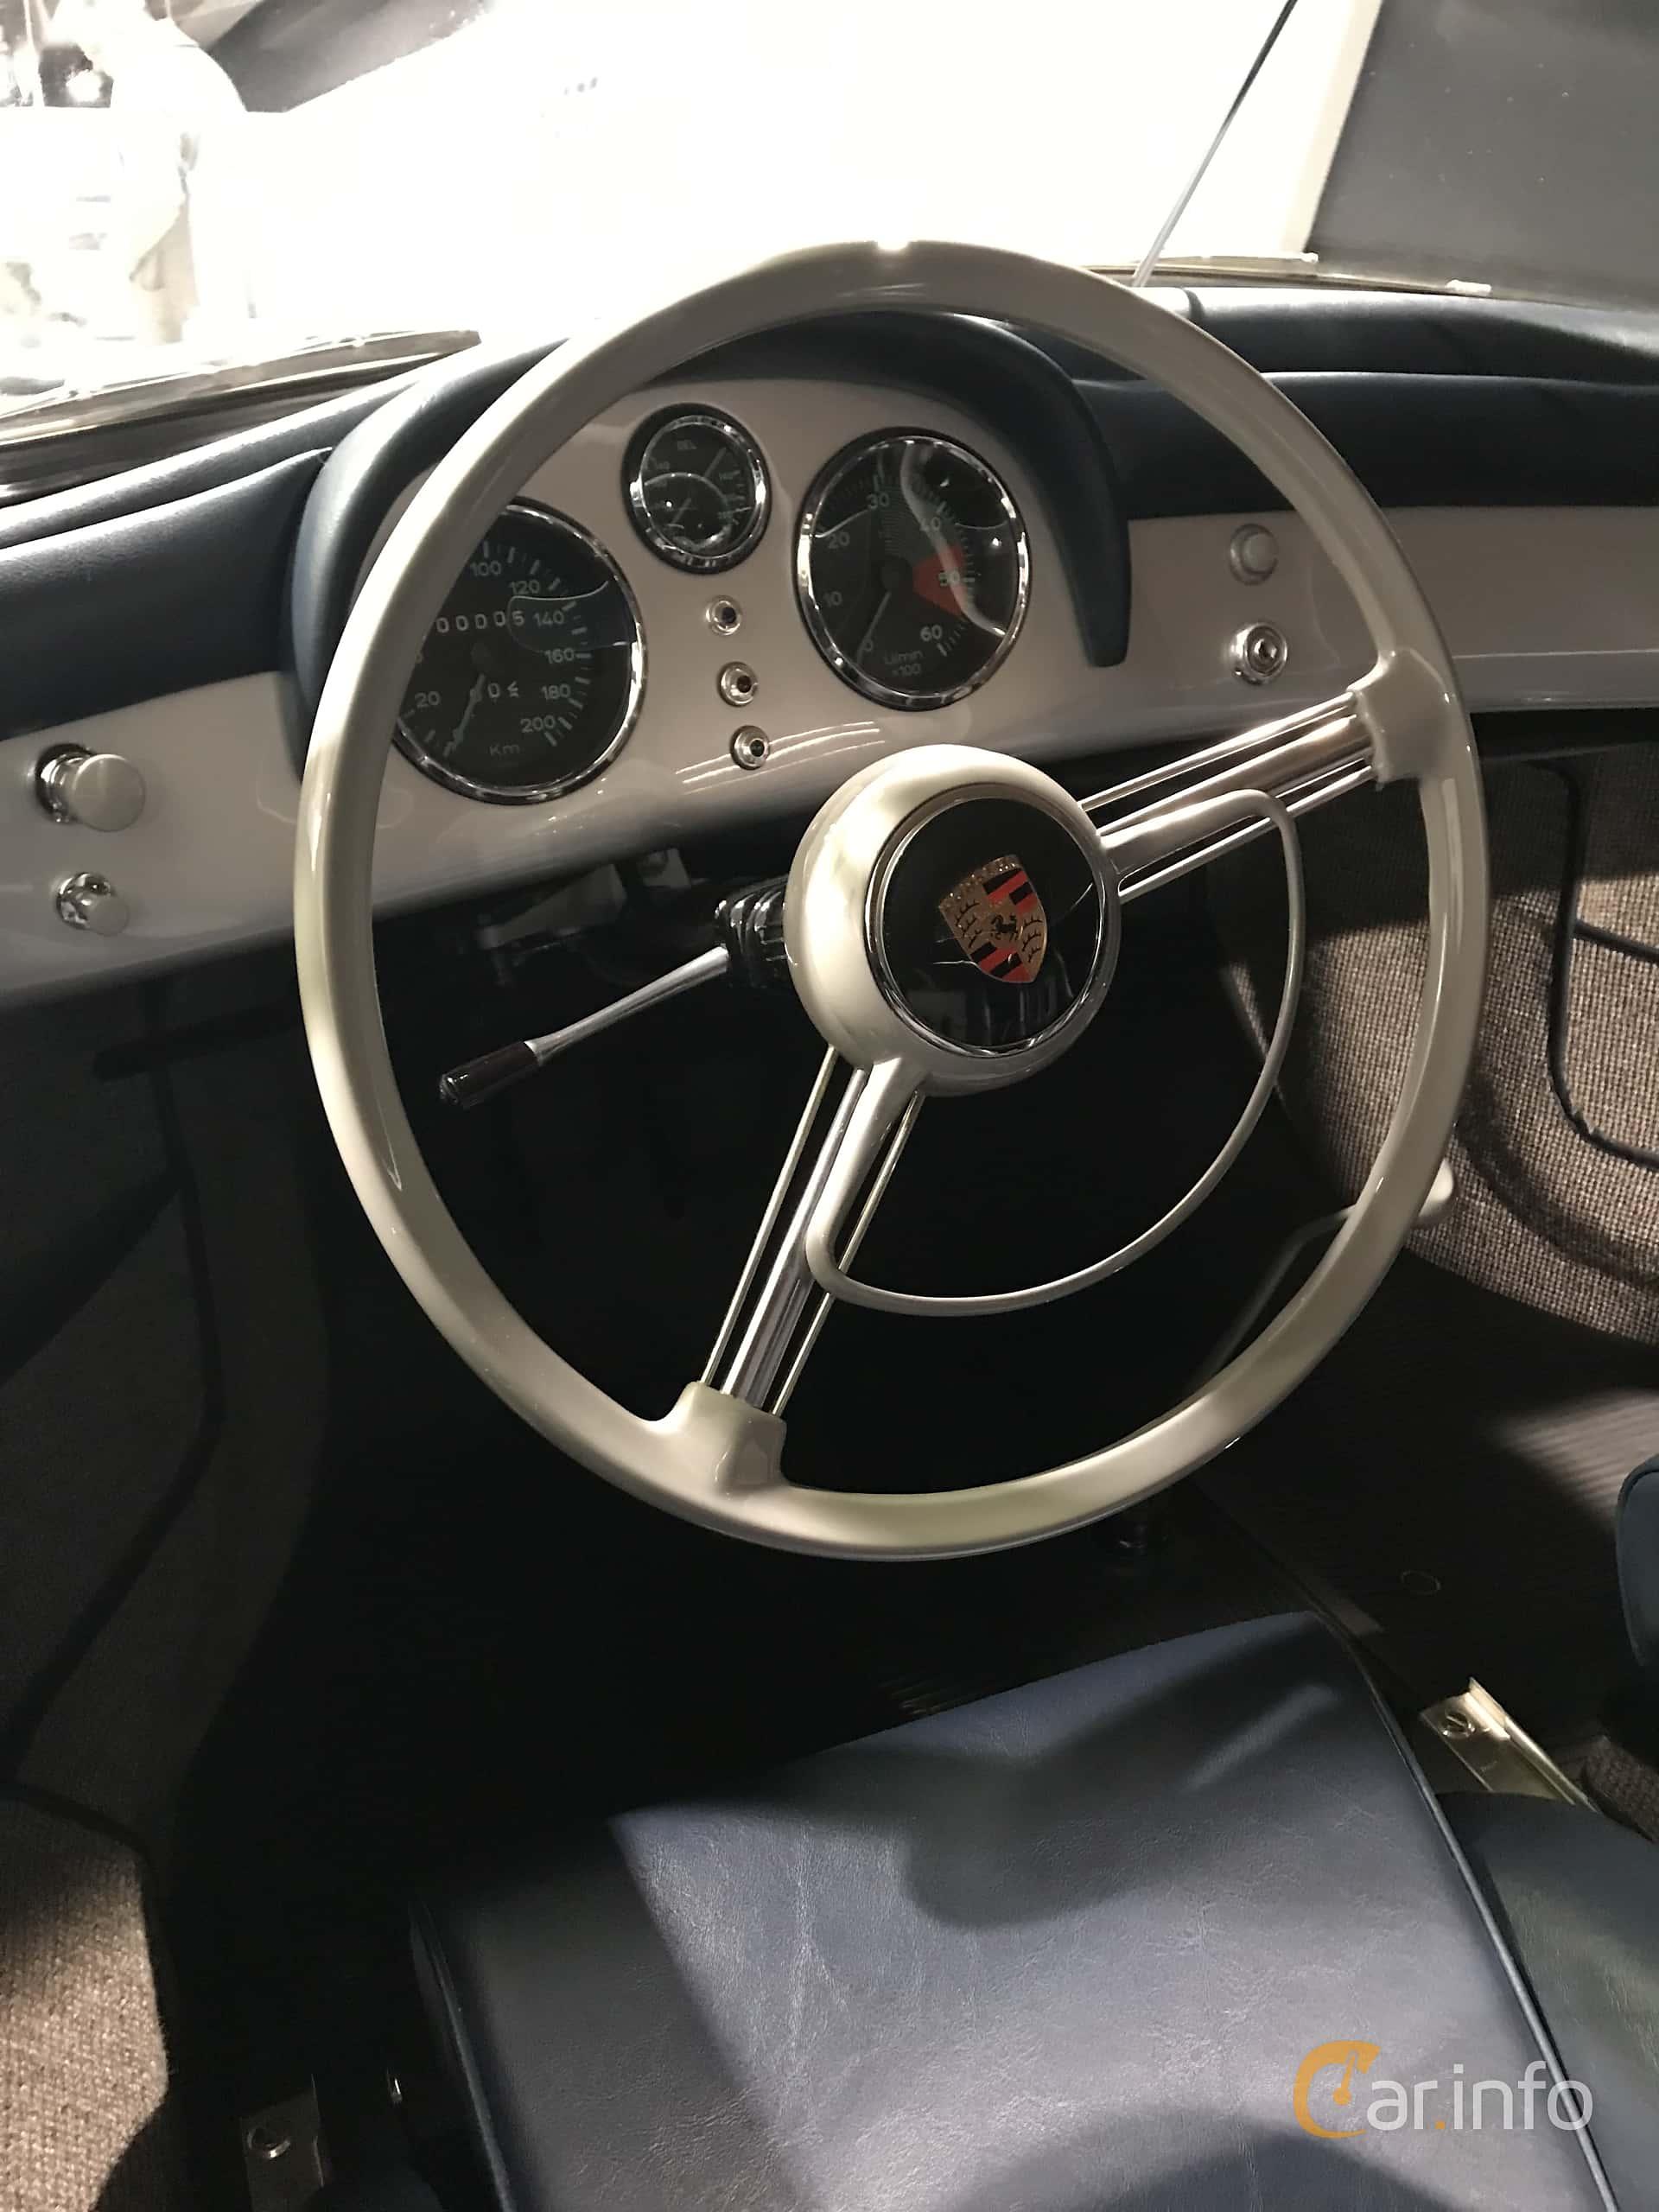 Interior of Porsche 356 1500 Speedster 1.5 Manual, 55ps, 1954